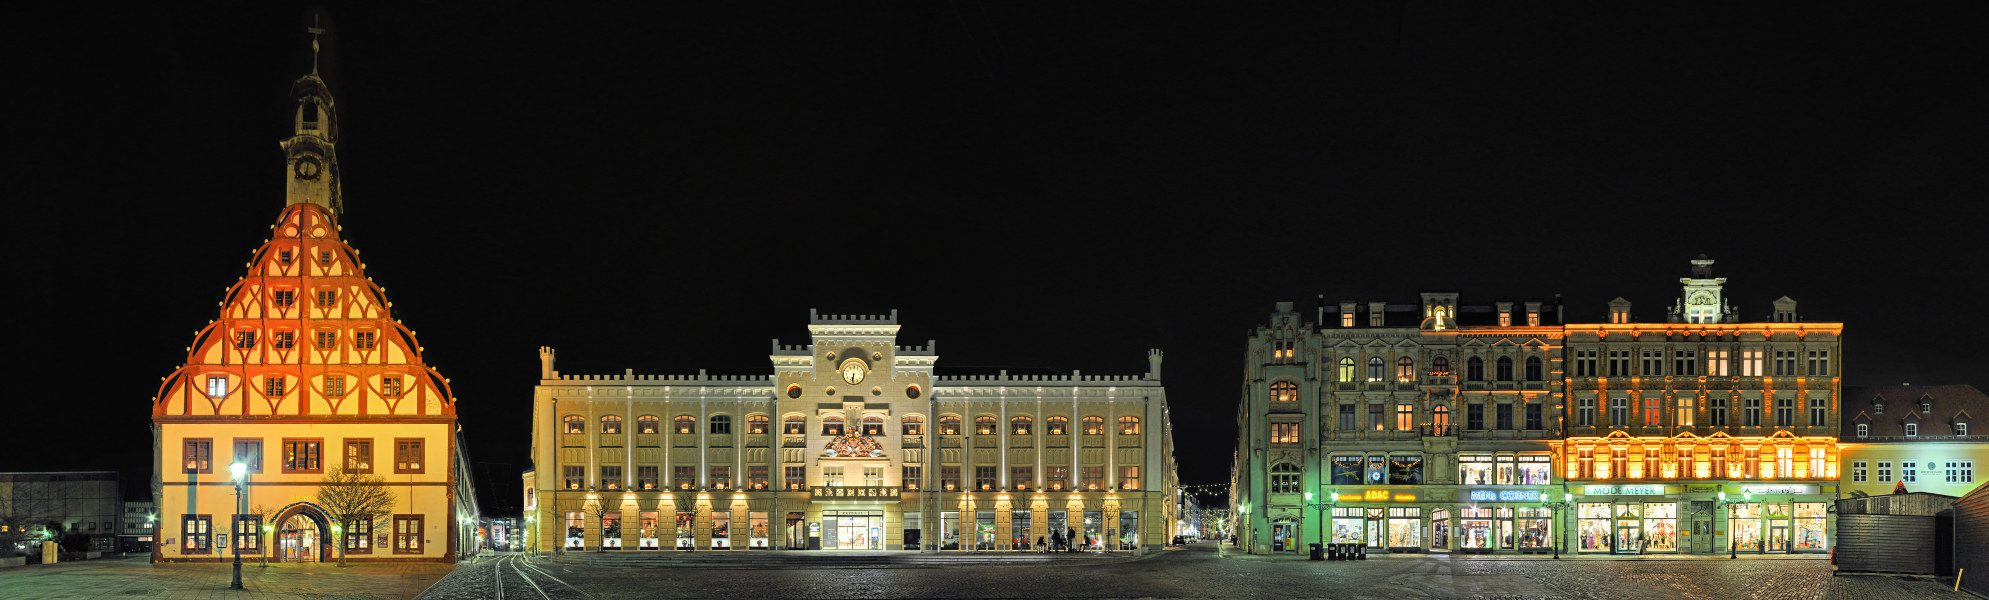 Gewandhaus | Town Hall | Hauptmarkt